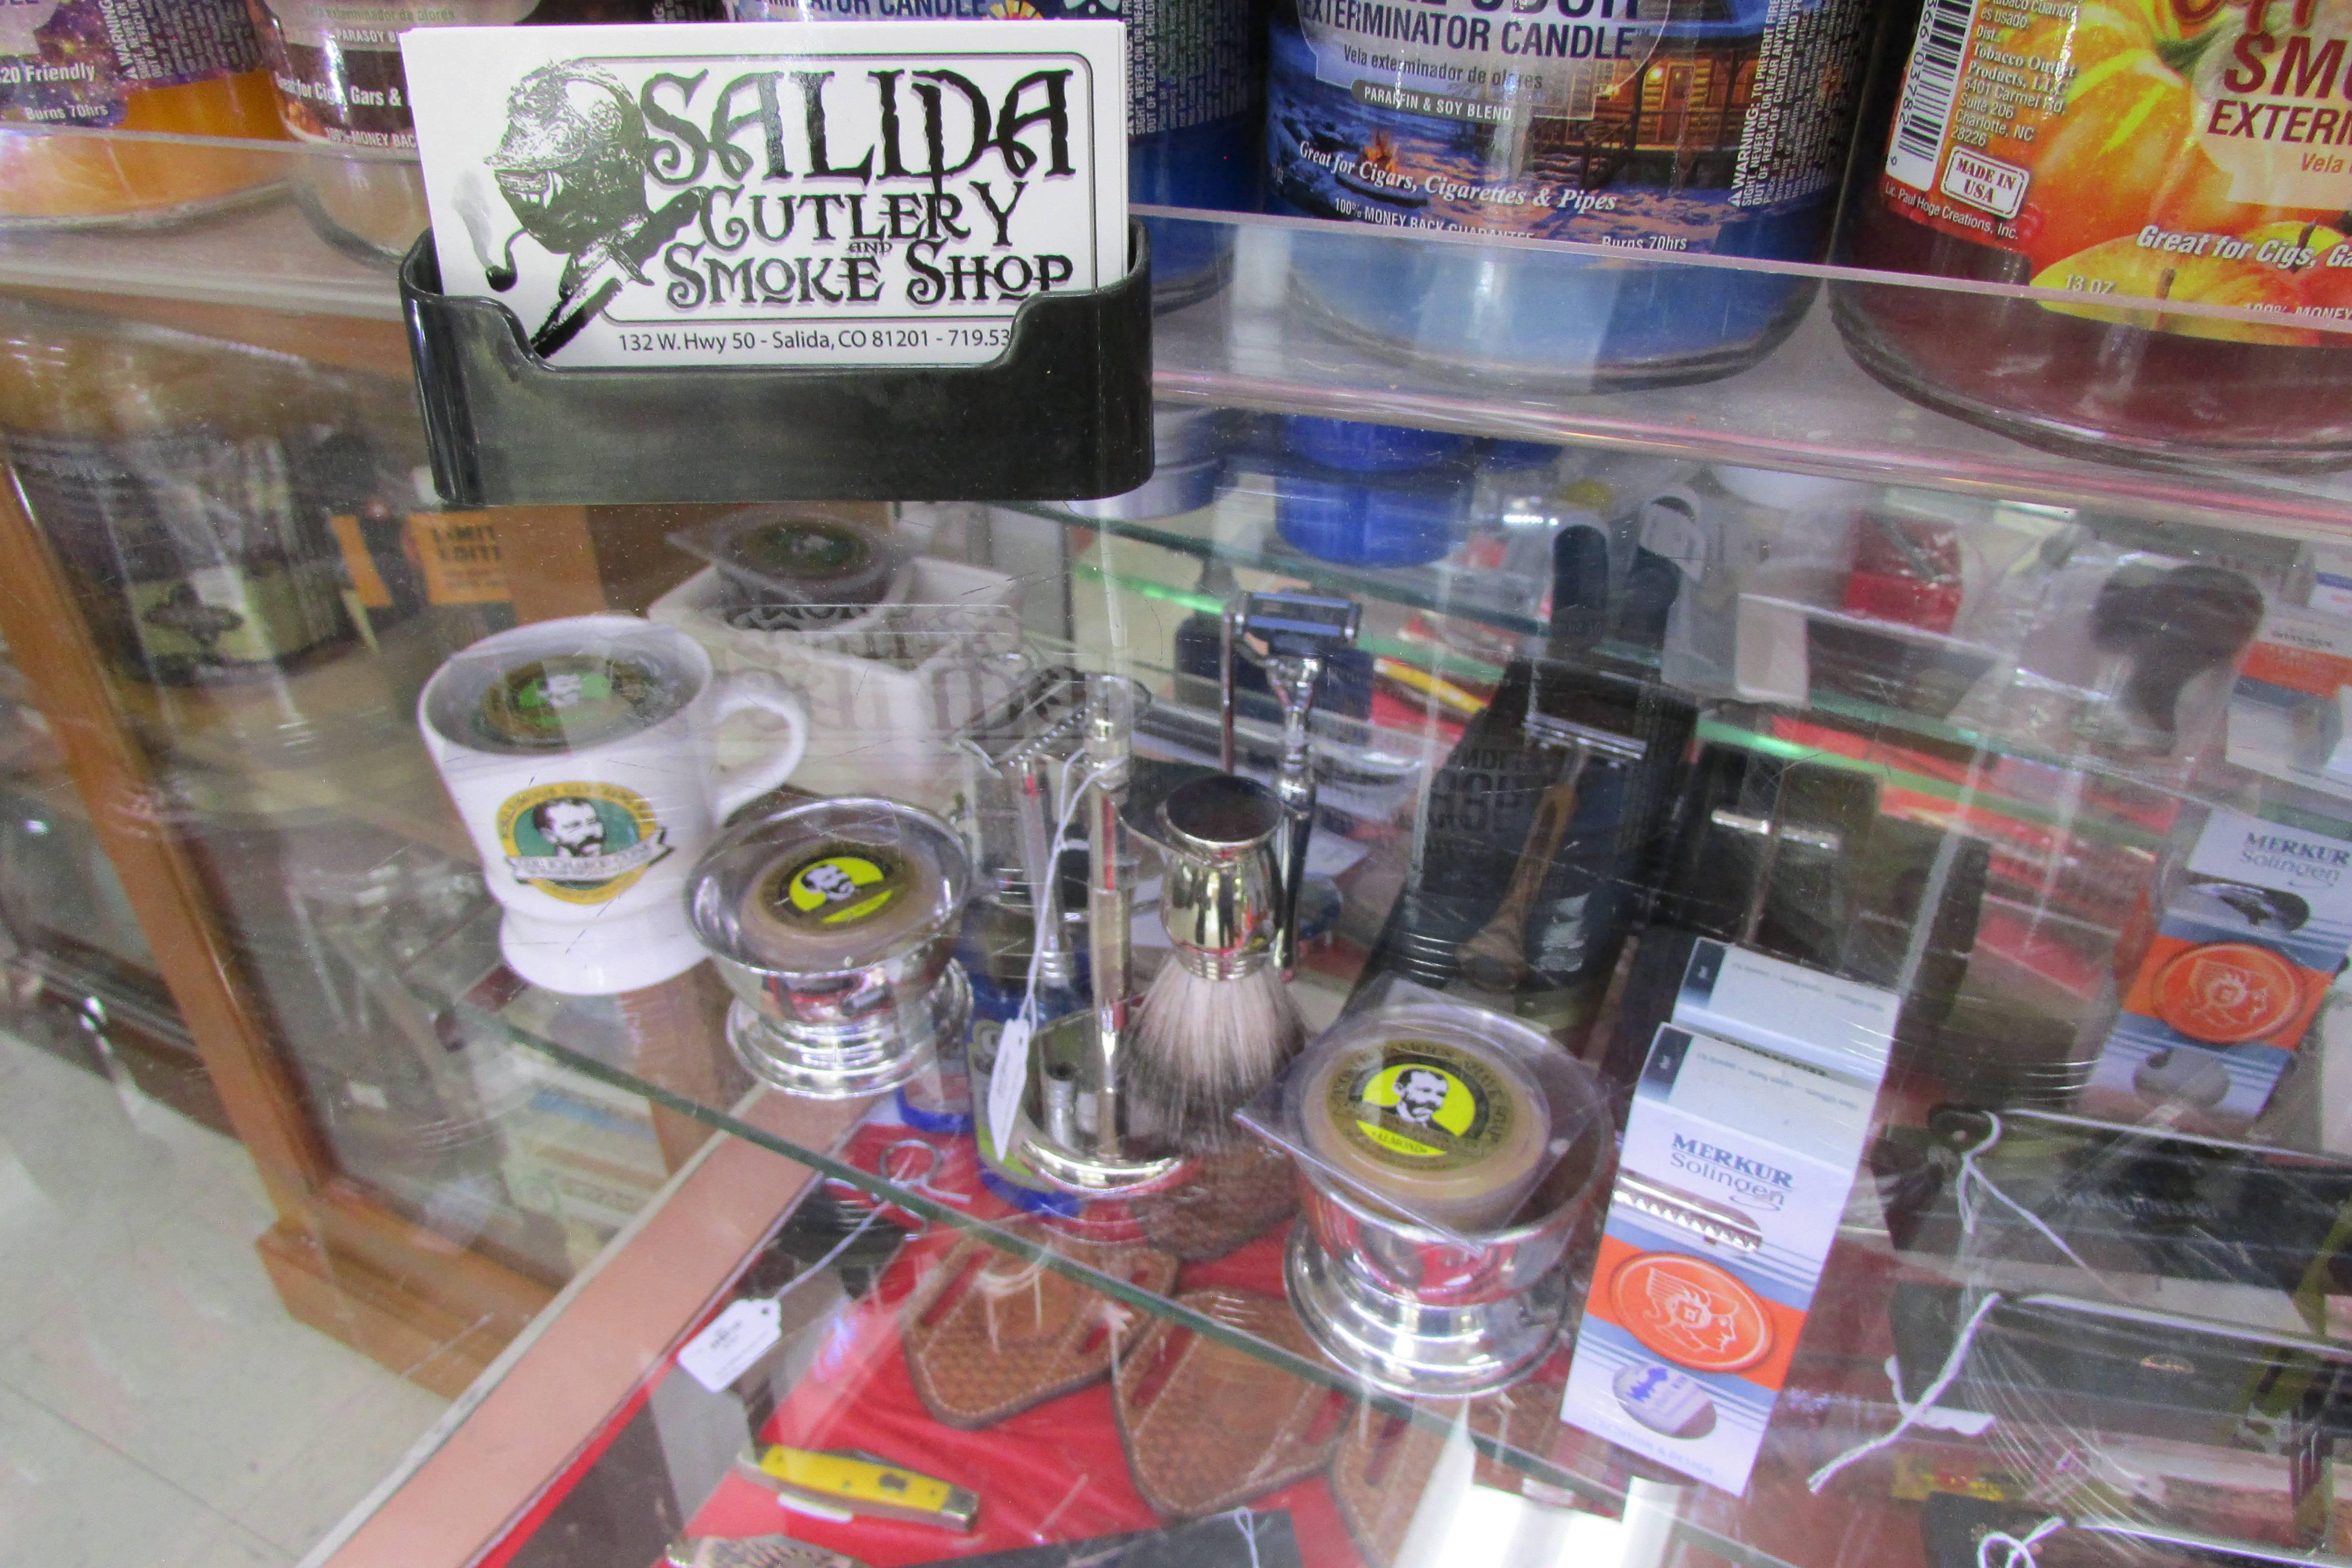 Shaving Supplies